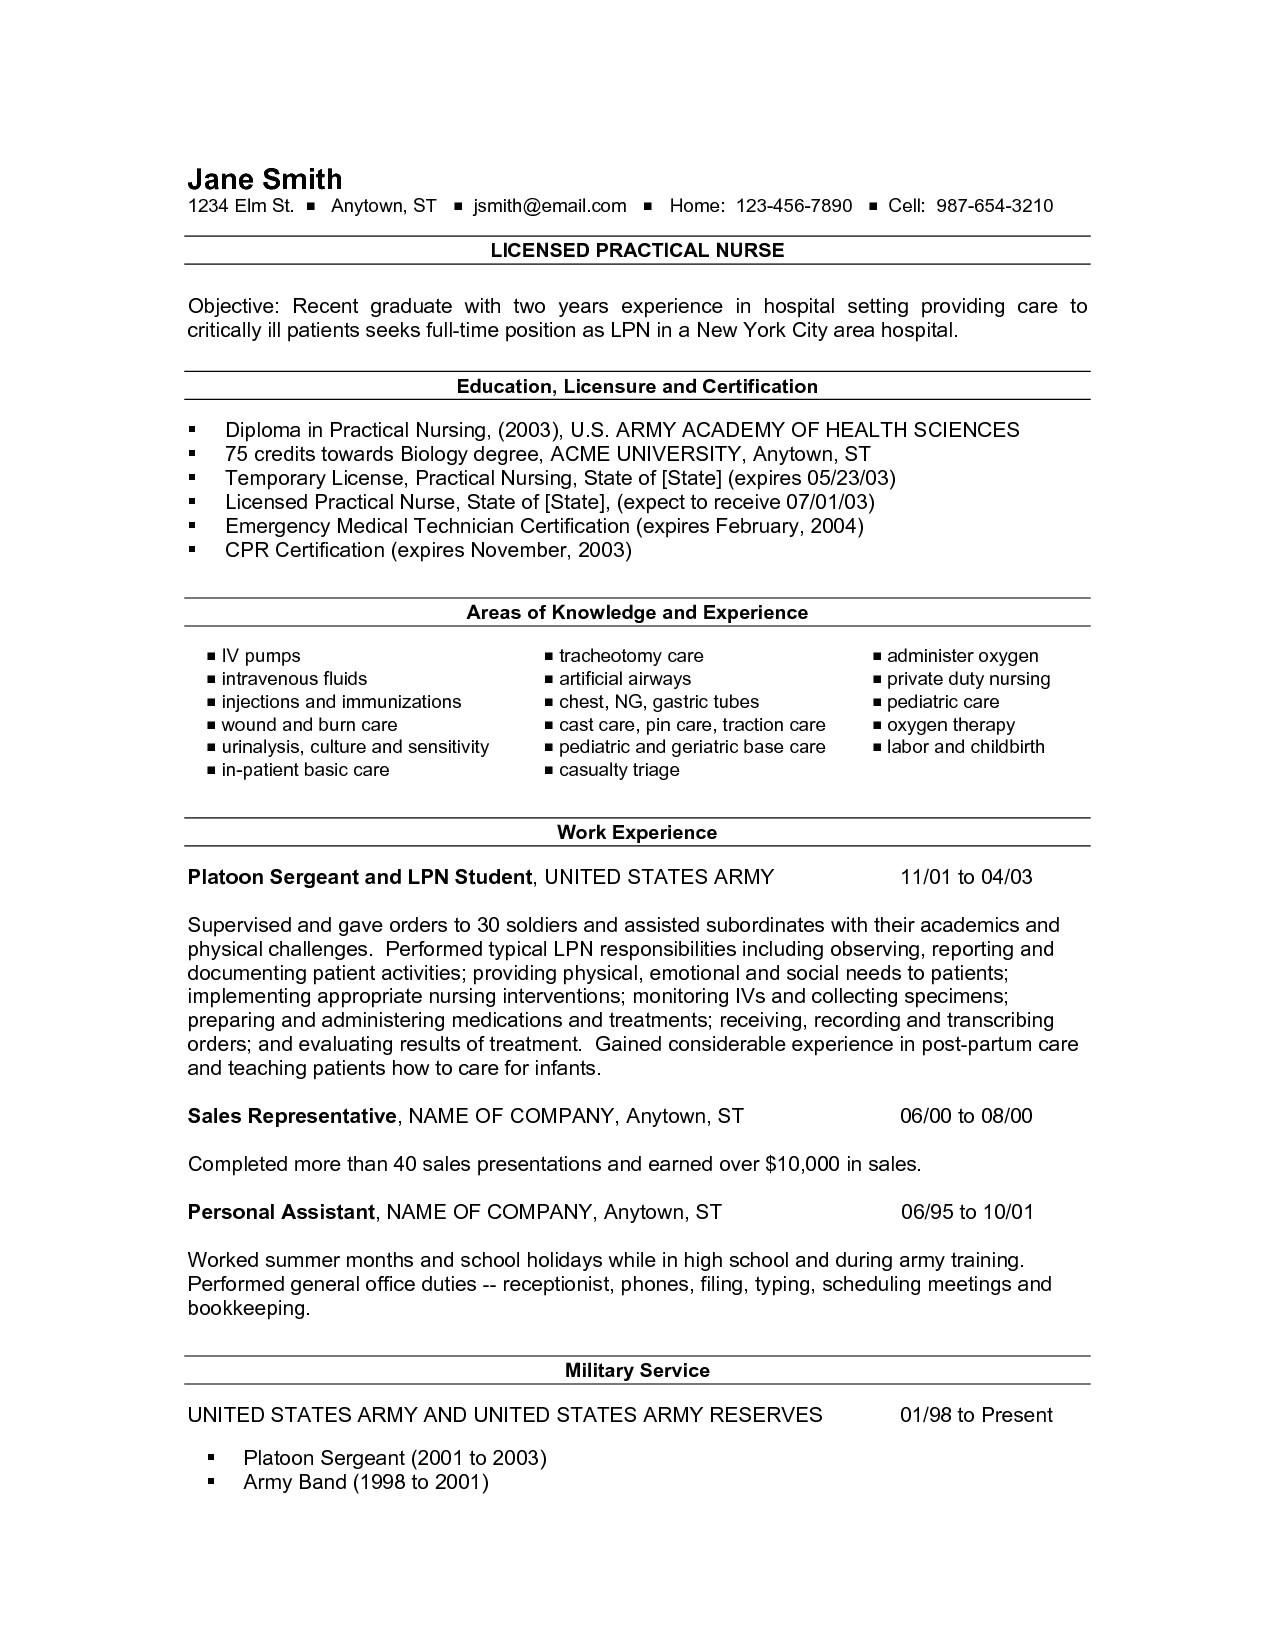 Free Resume Templates for Lpn Nurses Examples Of Lpn Resume Cv Help Layout Nursing Student